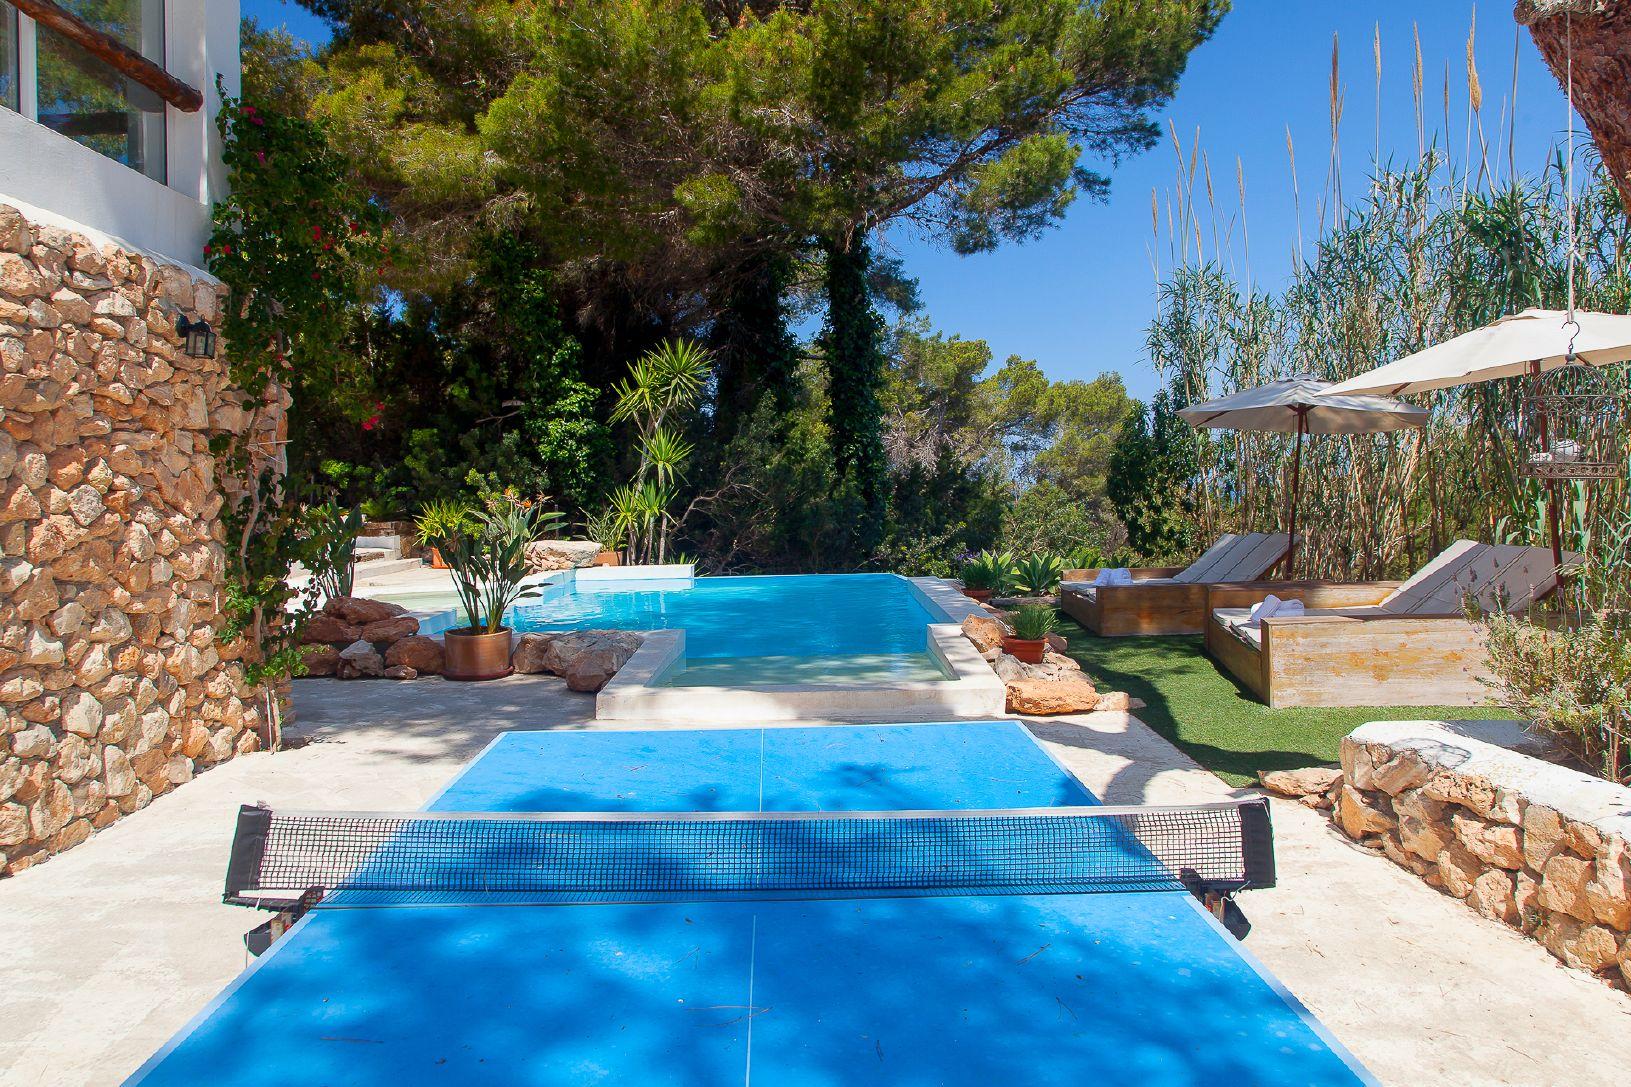 Alquiler de casa rural con piscina en ibiza villa ves - Apartamentos alquiler en ibiza ...